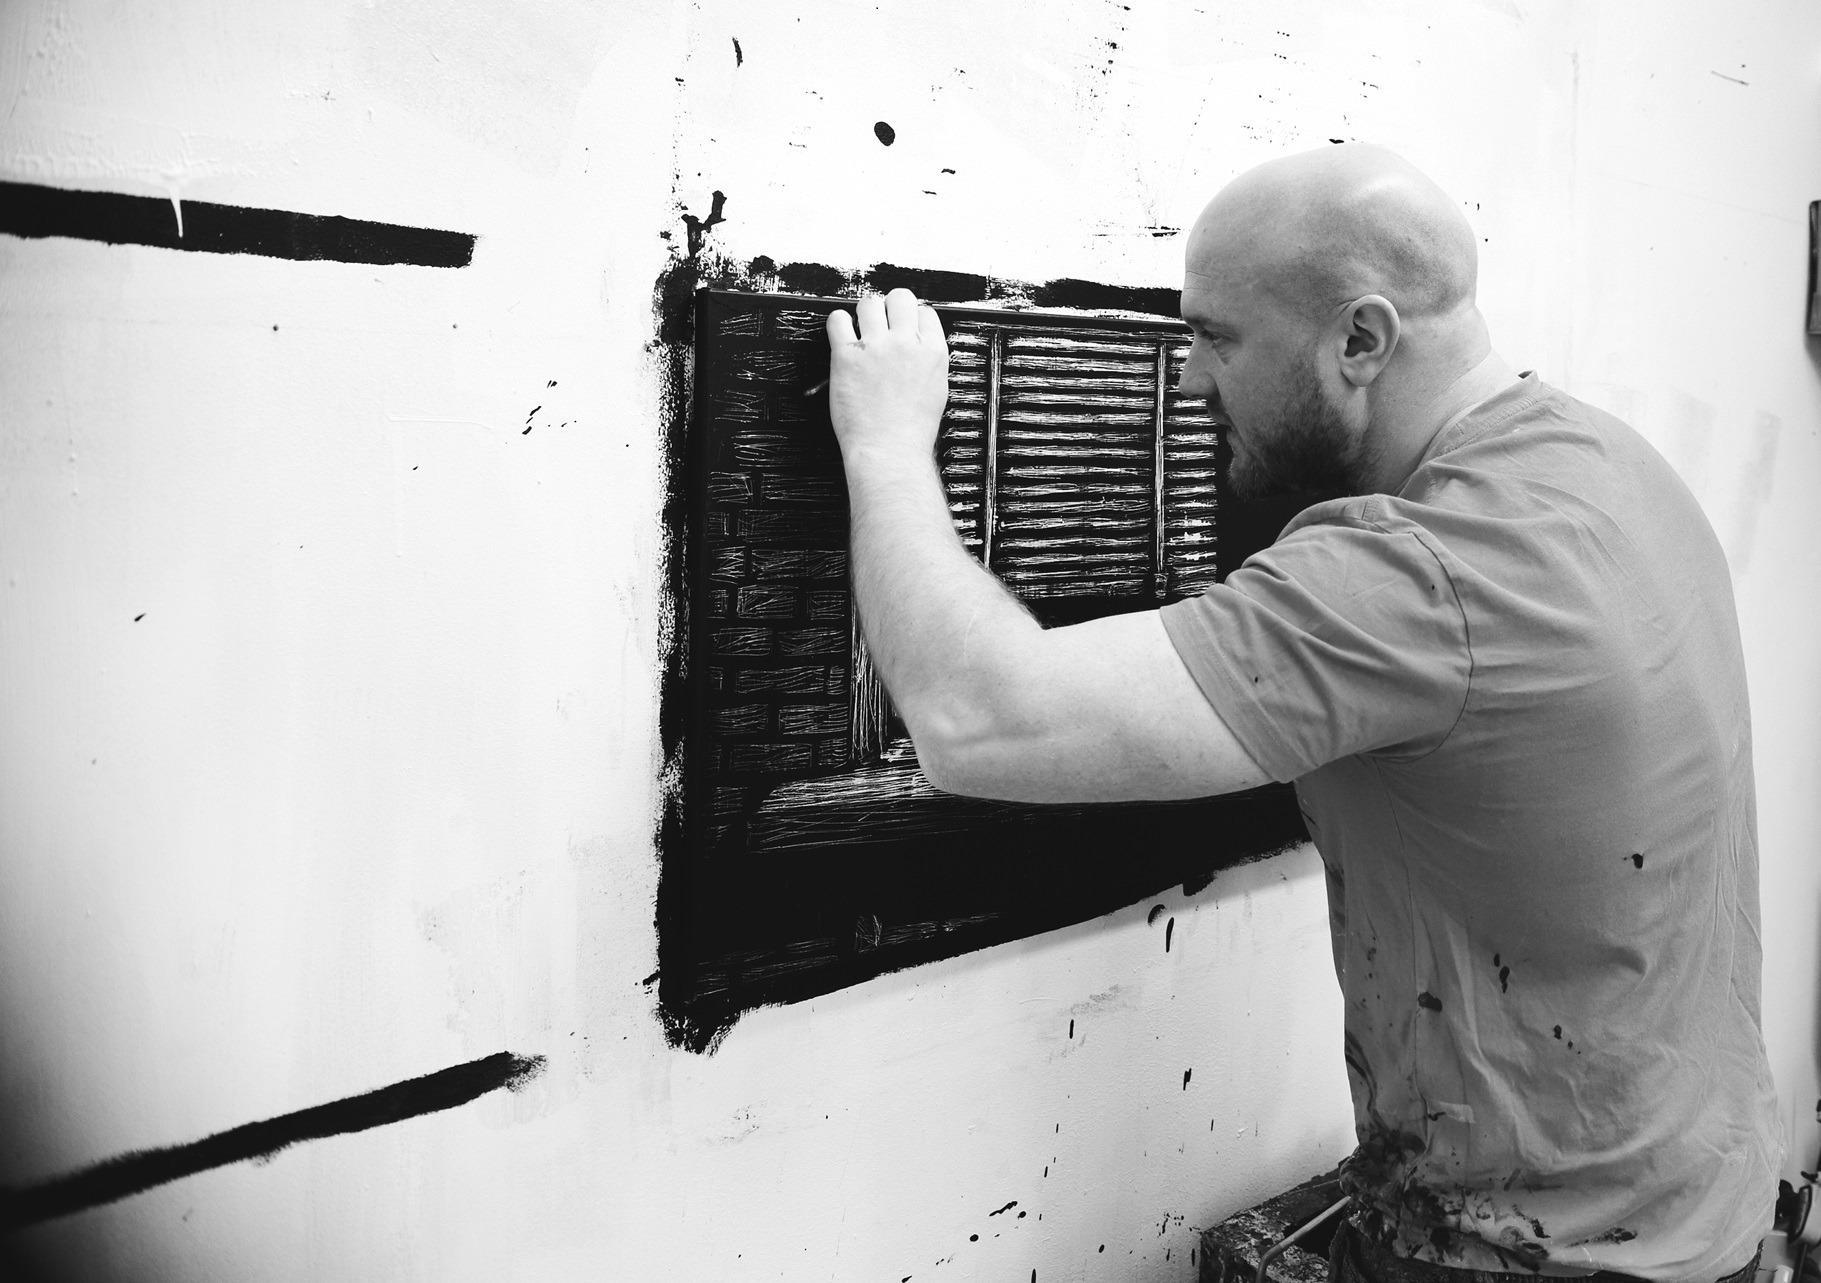 Nicolas_Ruston_In his studio_Photograph by Jens Marrot_1